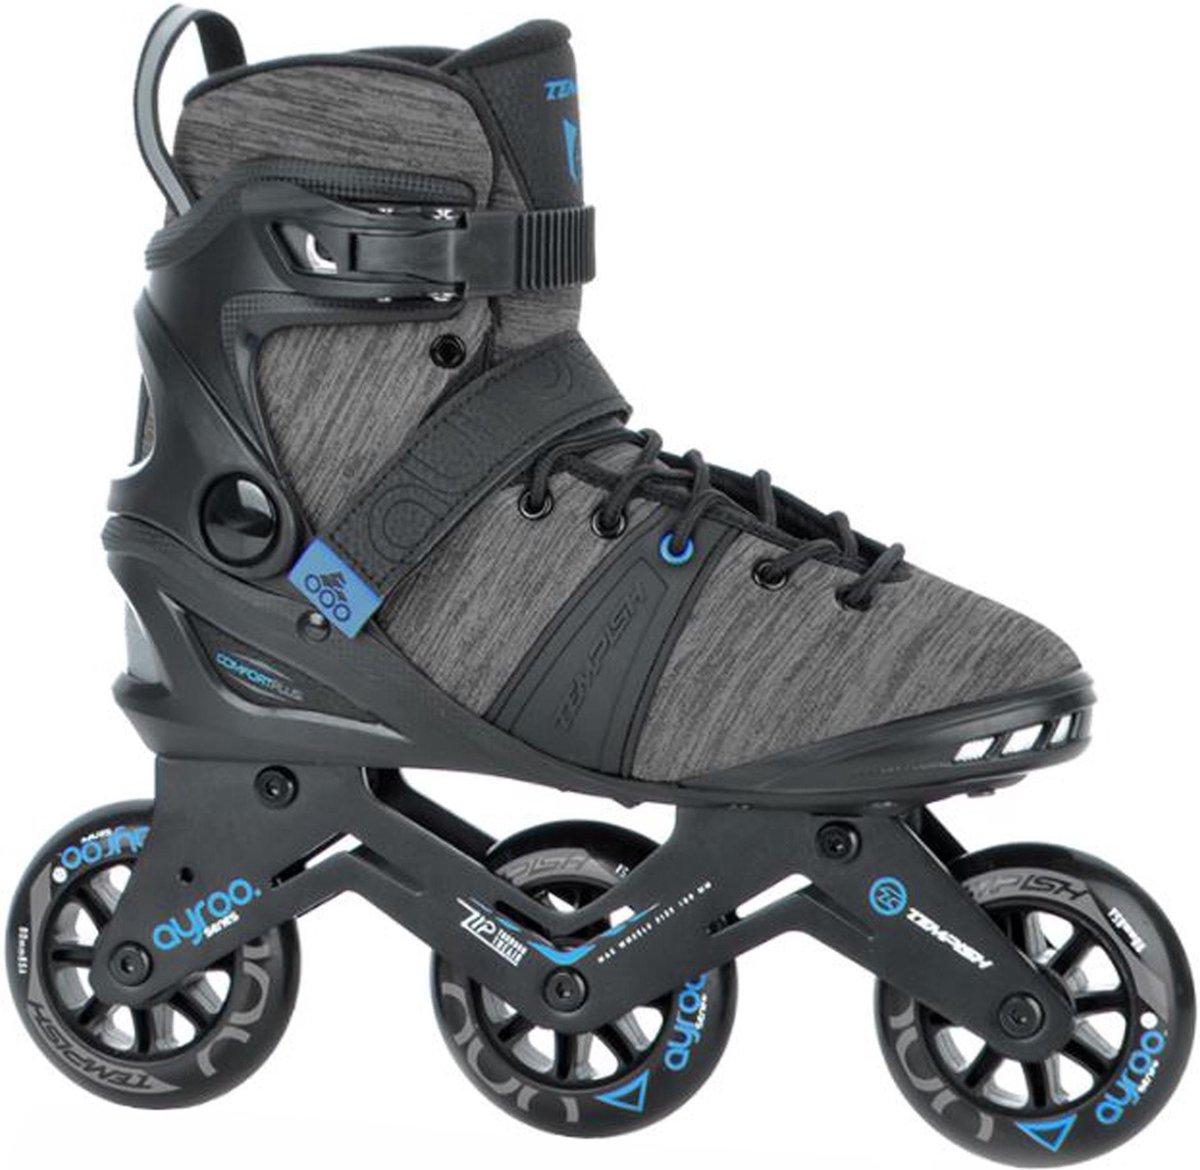 Tempish Ayroo 90 Inlineskates - Maat 41 - Unisex - zwart - grijs - blauw